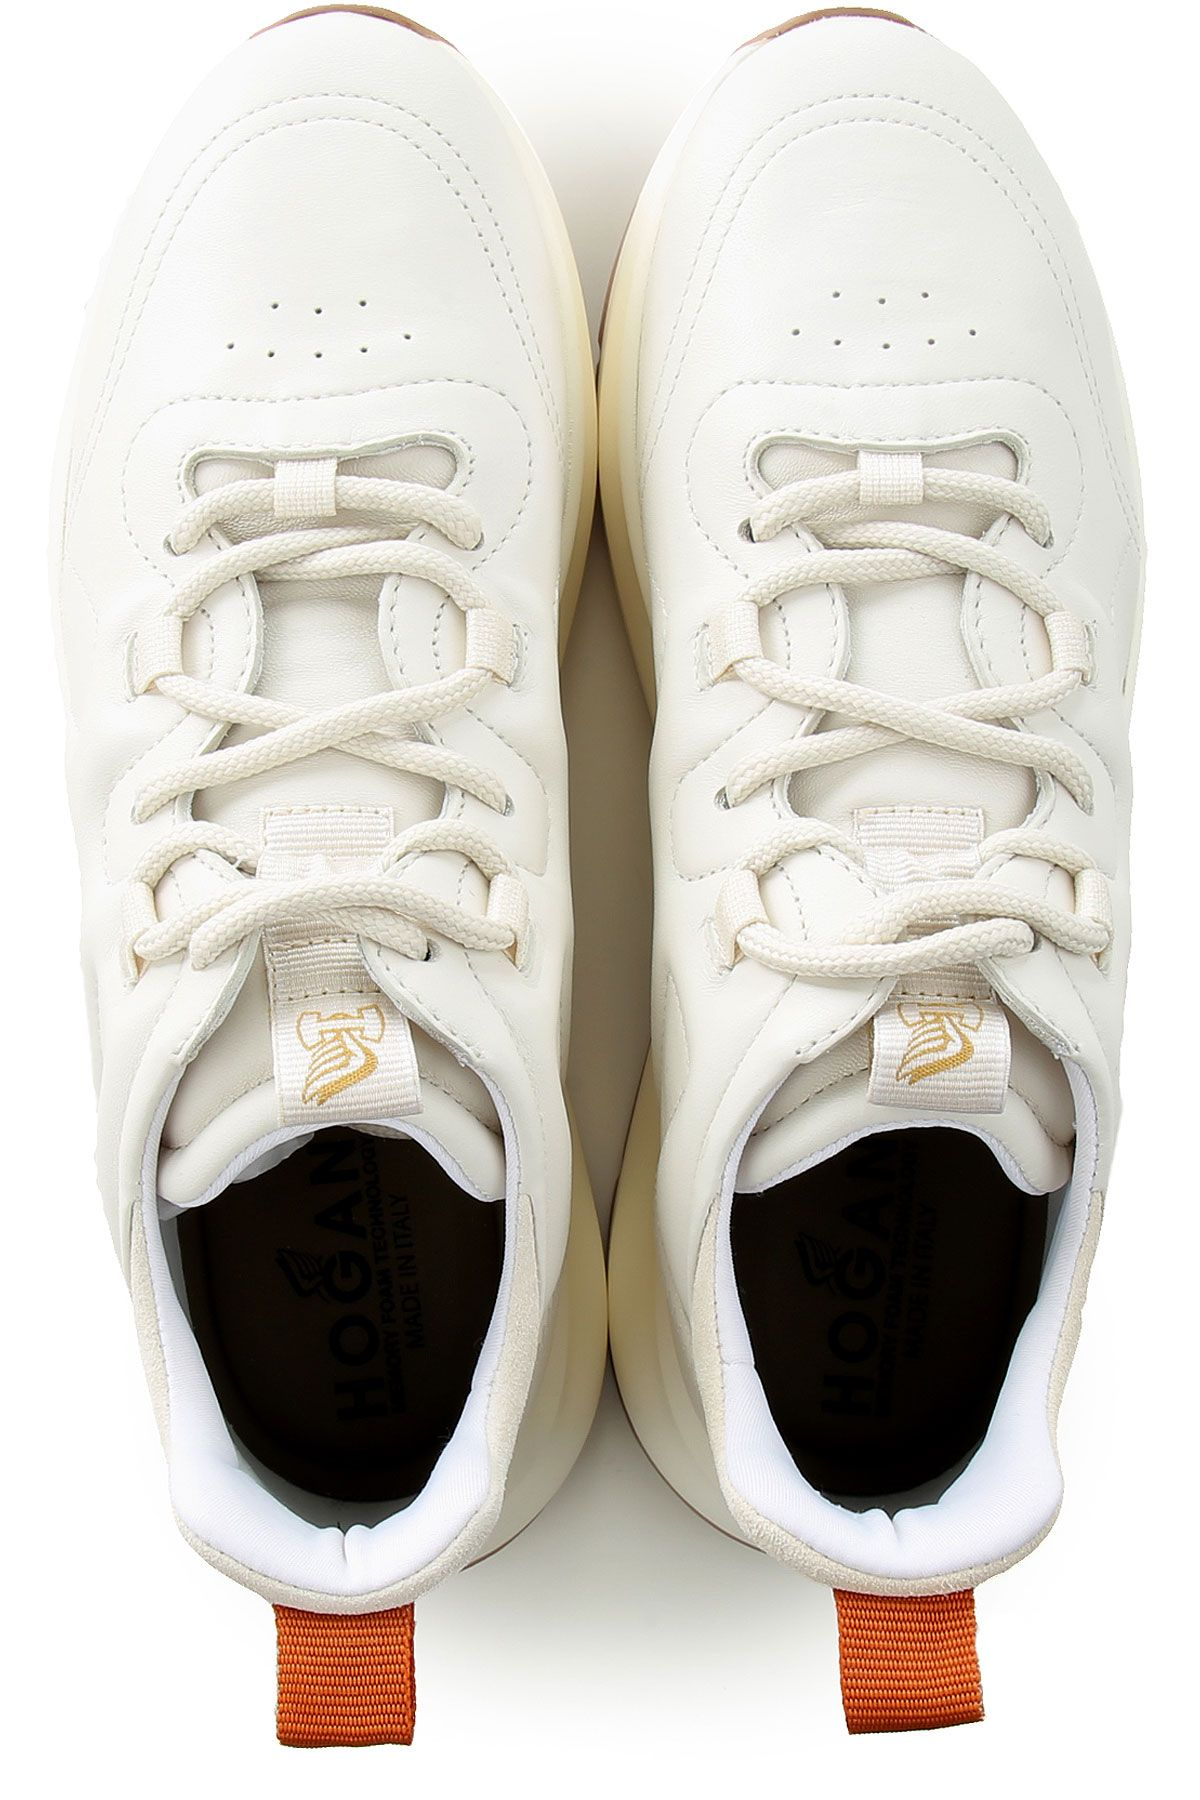 Womens Shoes Hogan, Style code: hxw5850du80qgv0ts1-- in 2021 ...